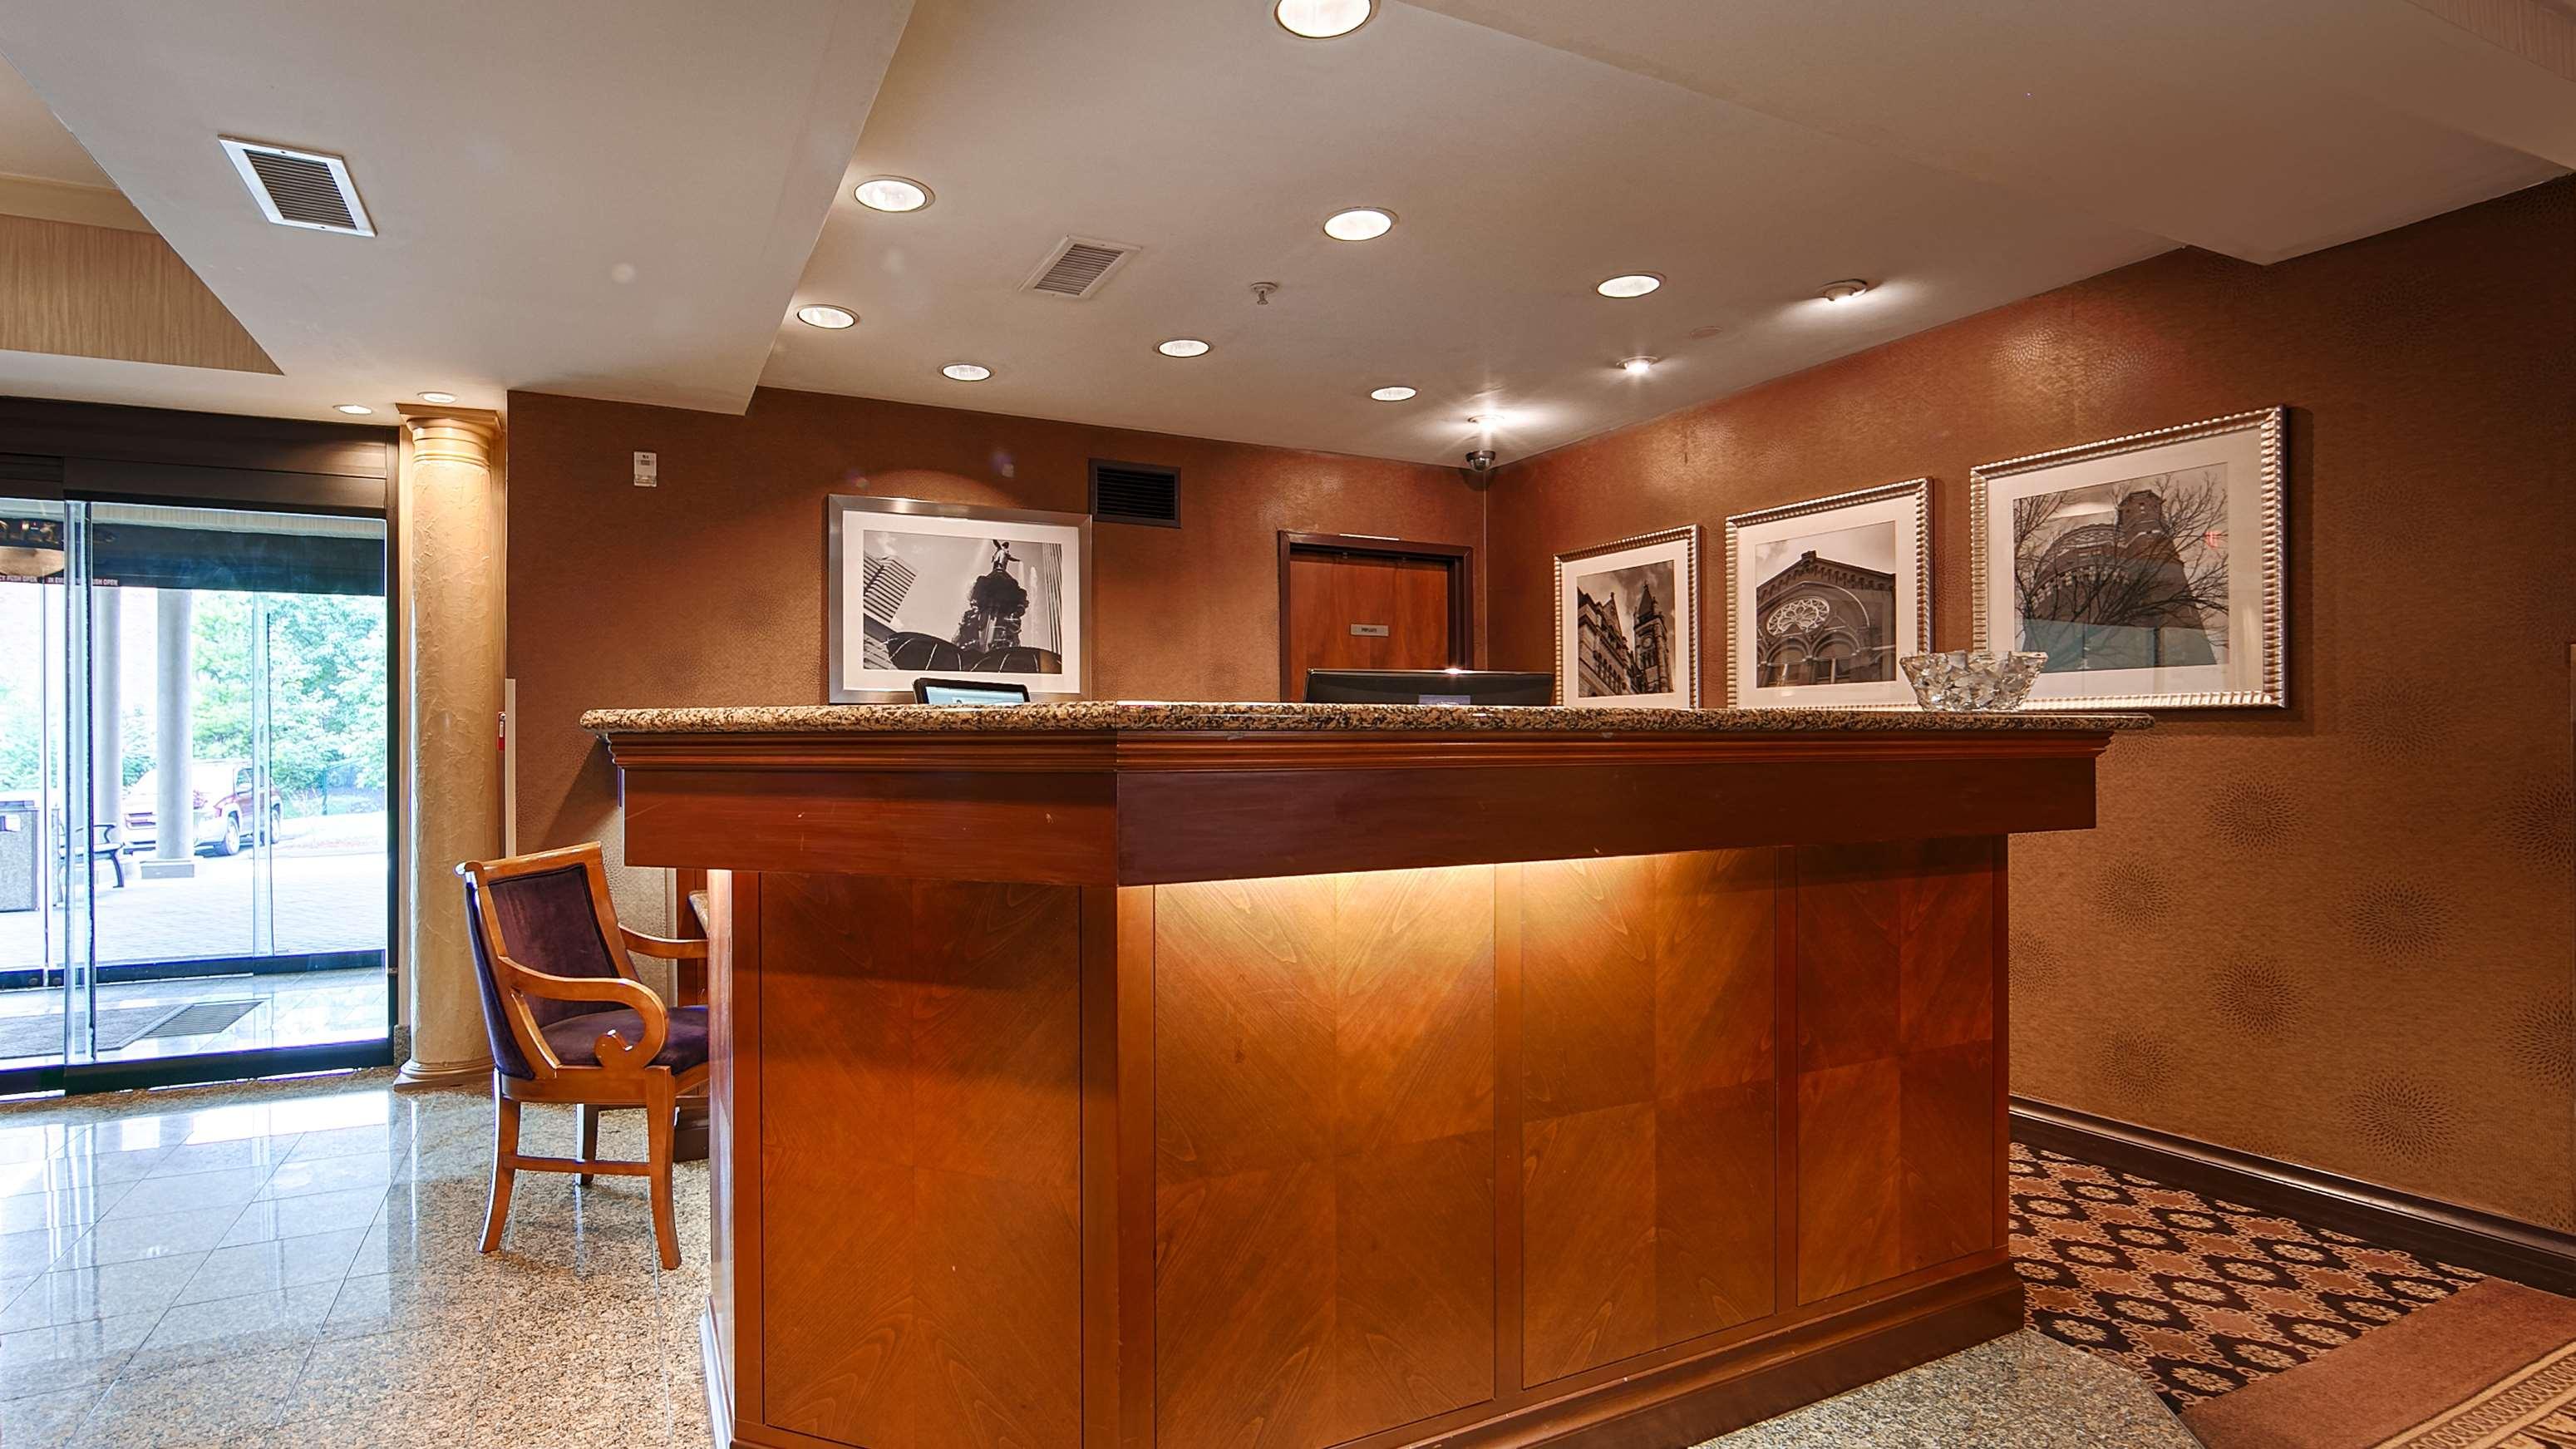 Best Western Plus Hannaford Inn & Suites image 5